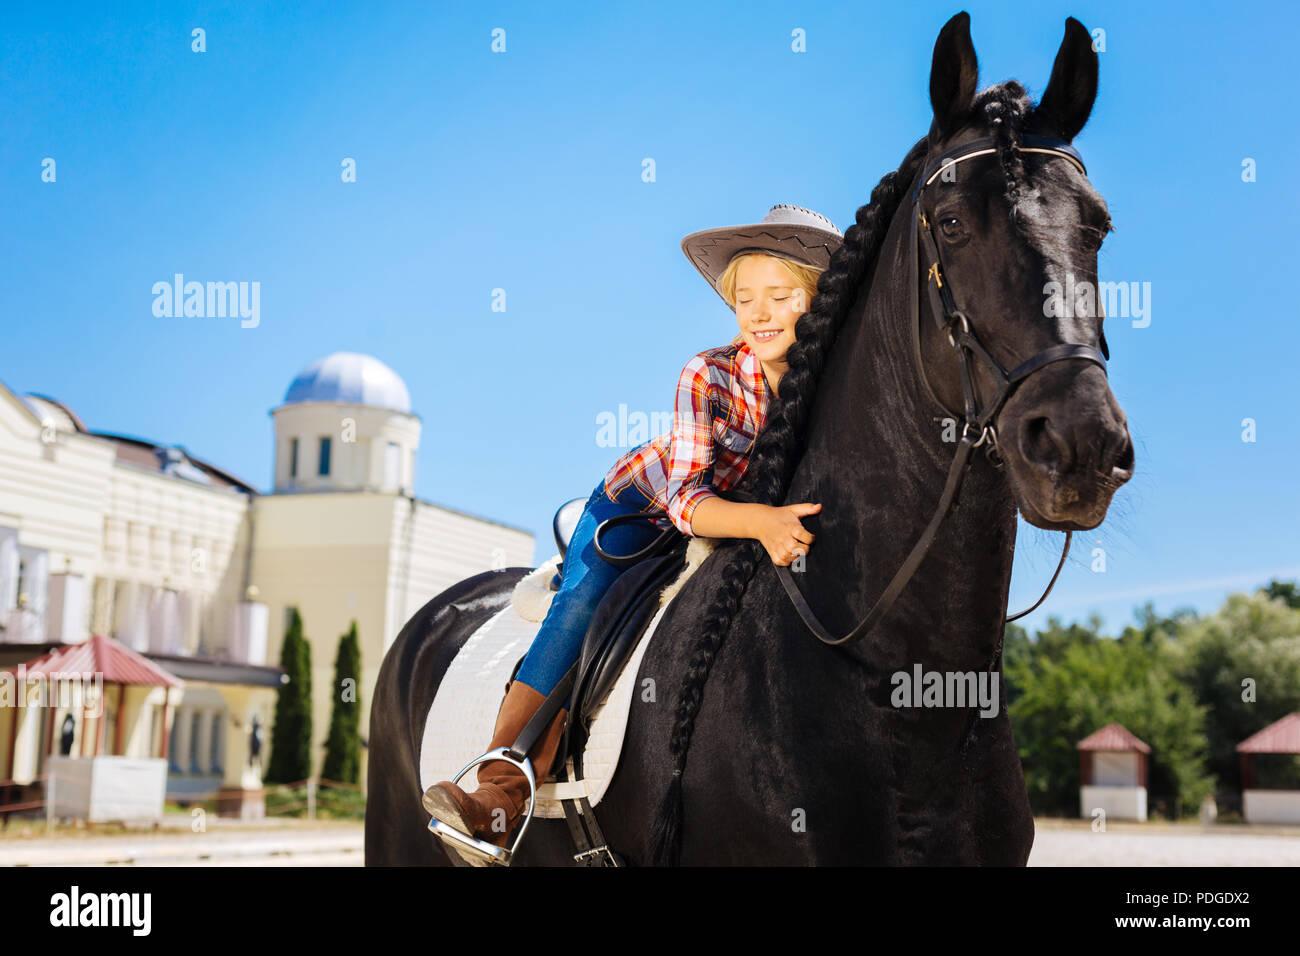 Cute cowboy girl hugging her beautiful black horse - Stock Image